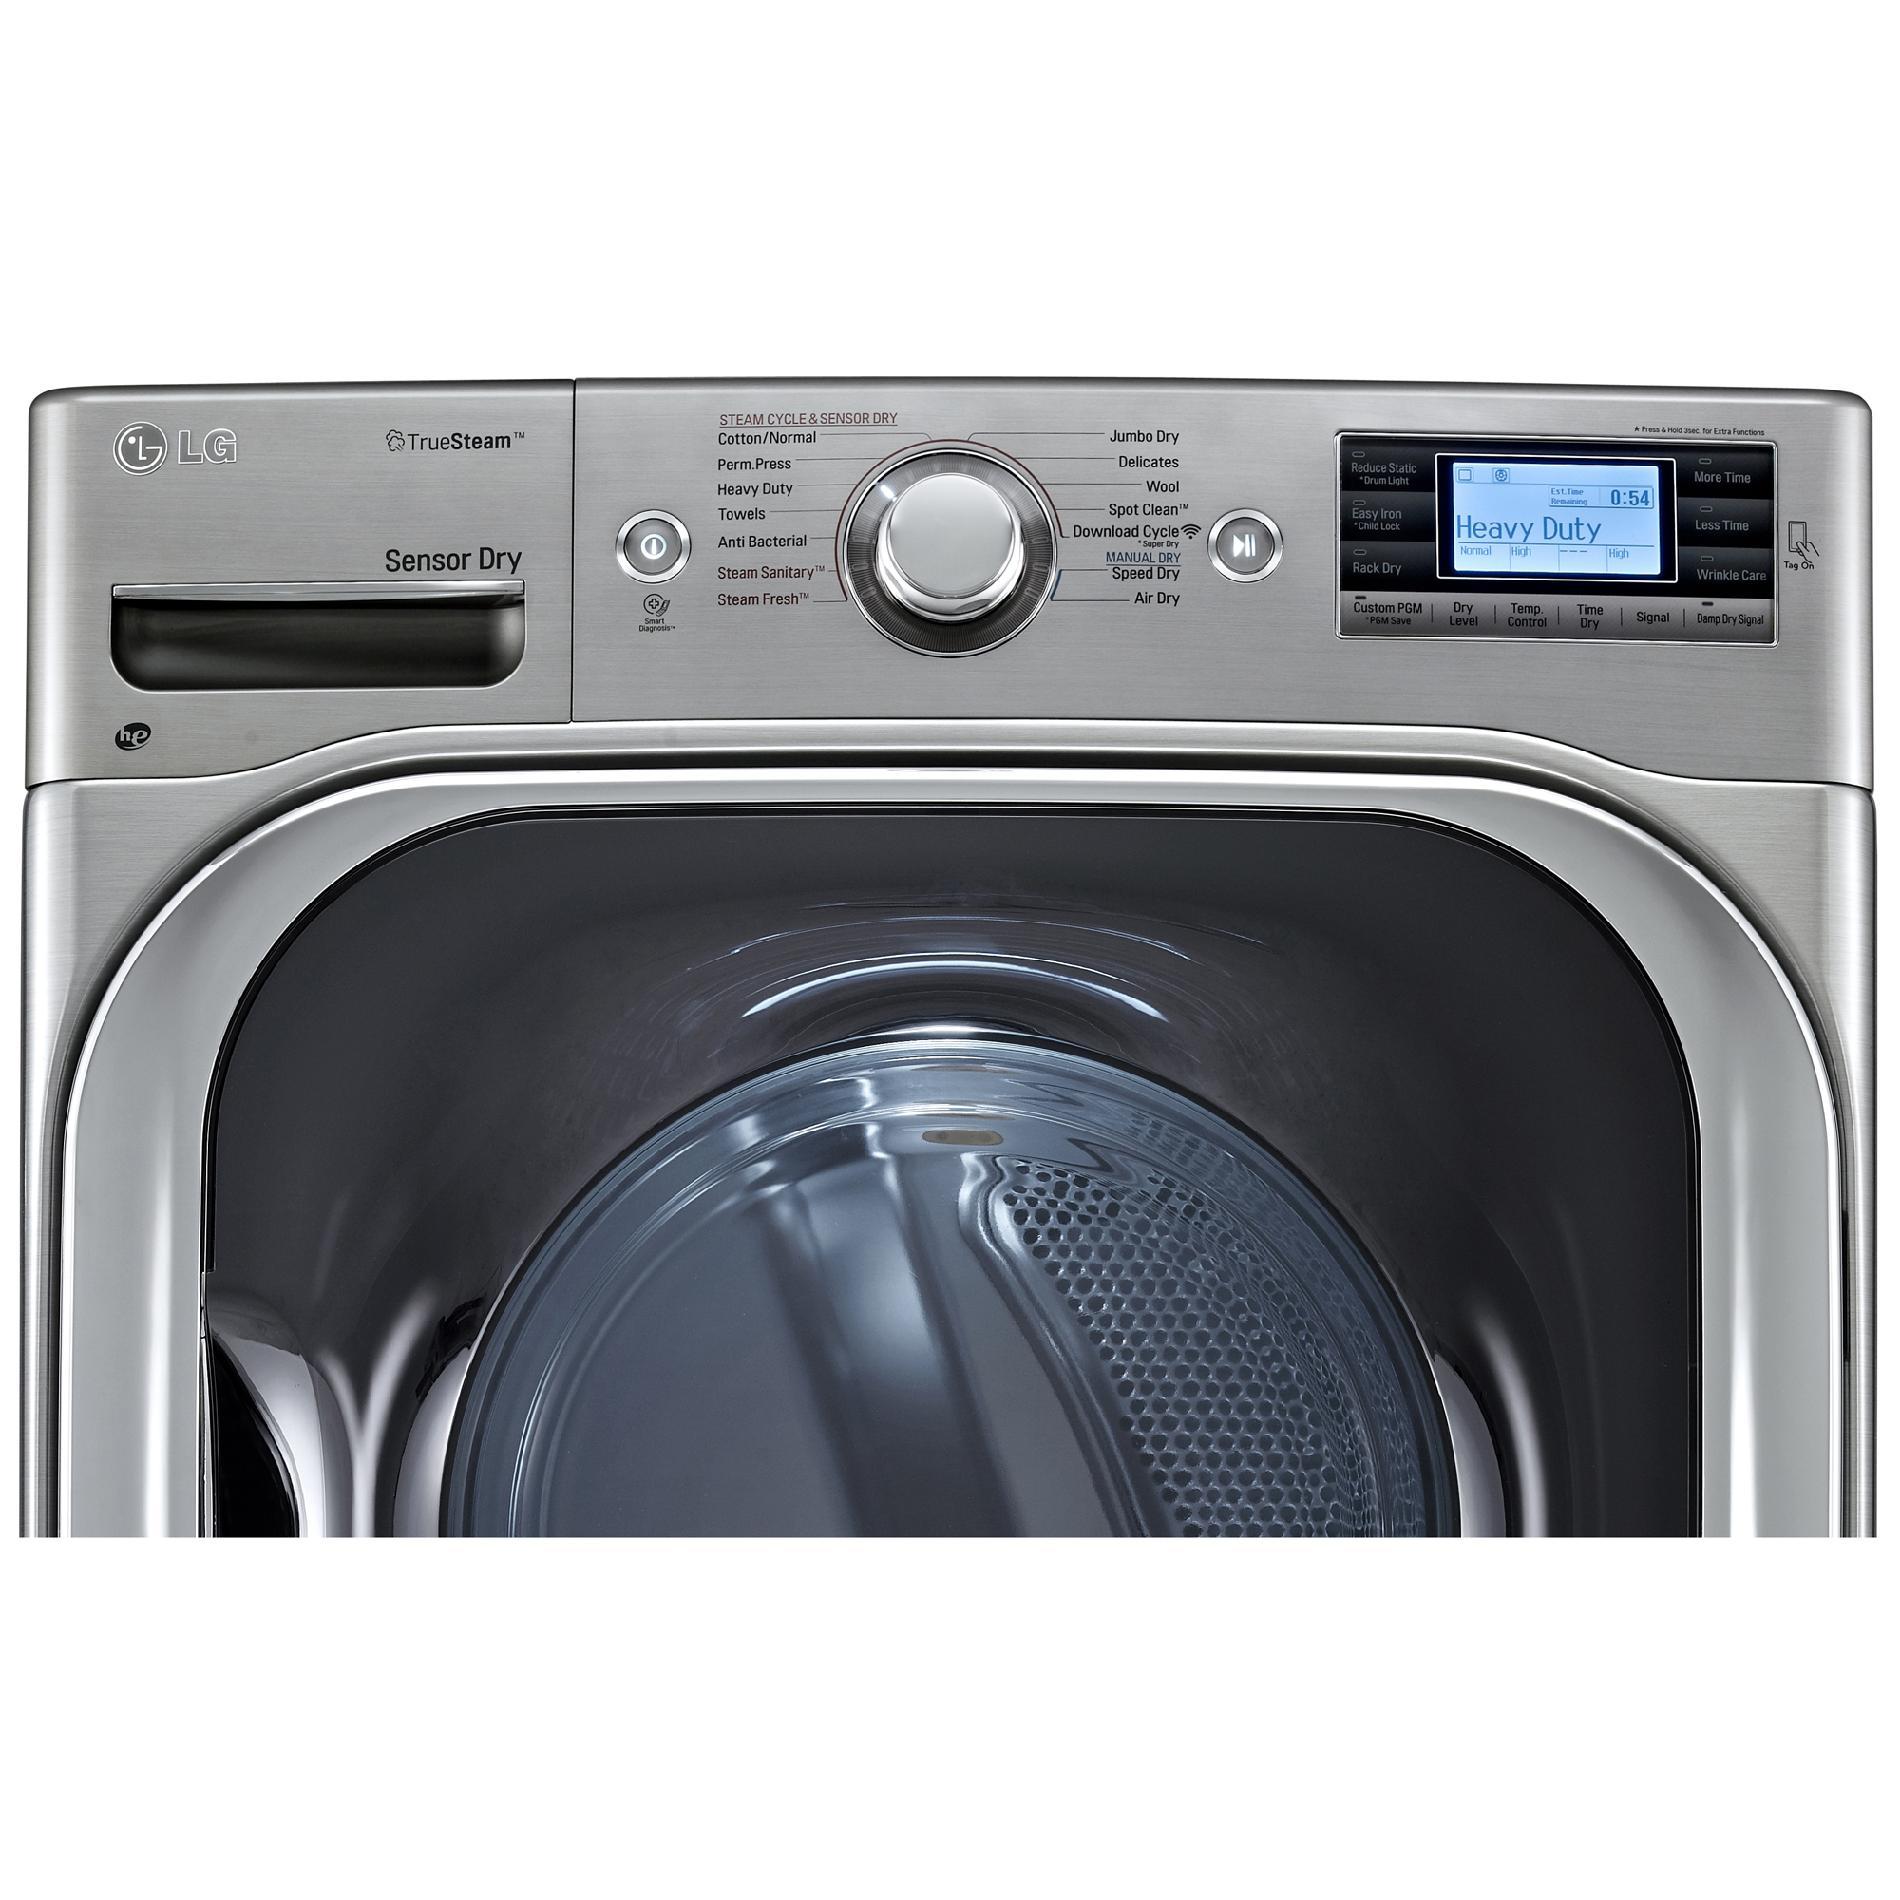 LG DLGX8501V 9.0 Cu. Ft. Mega Capacity Gas Dryer w/ Steam Technology